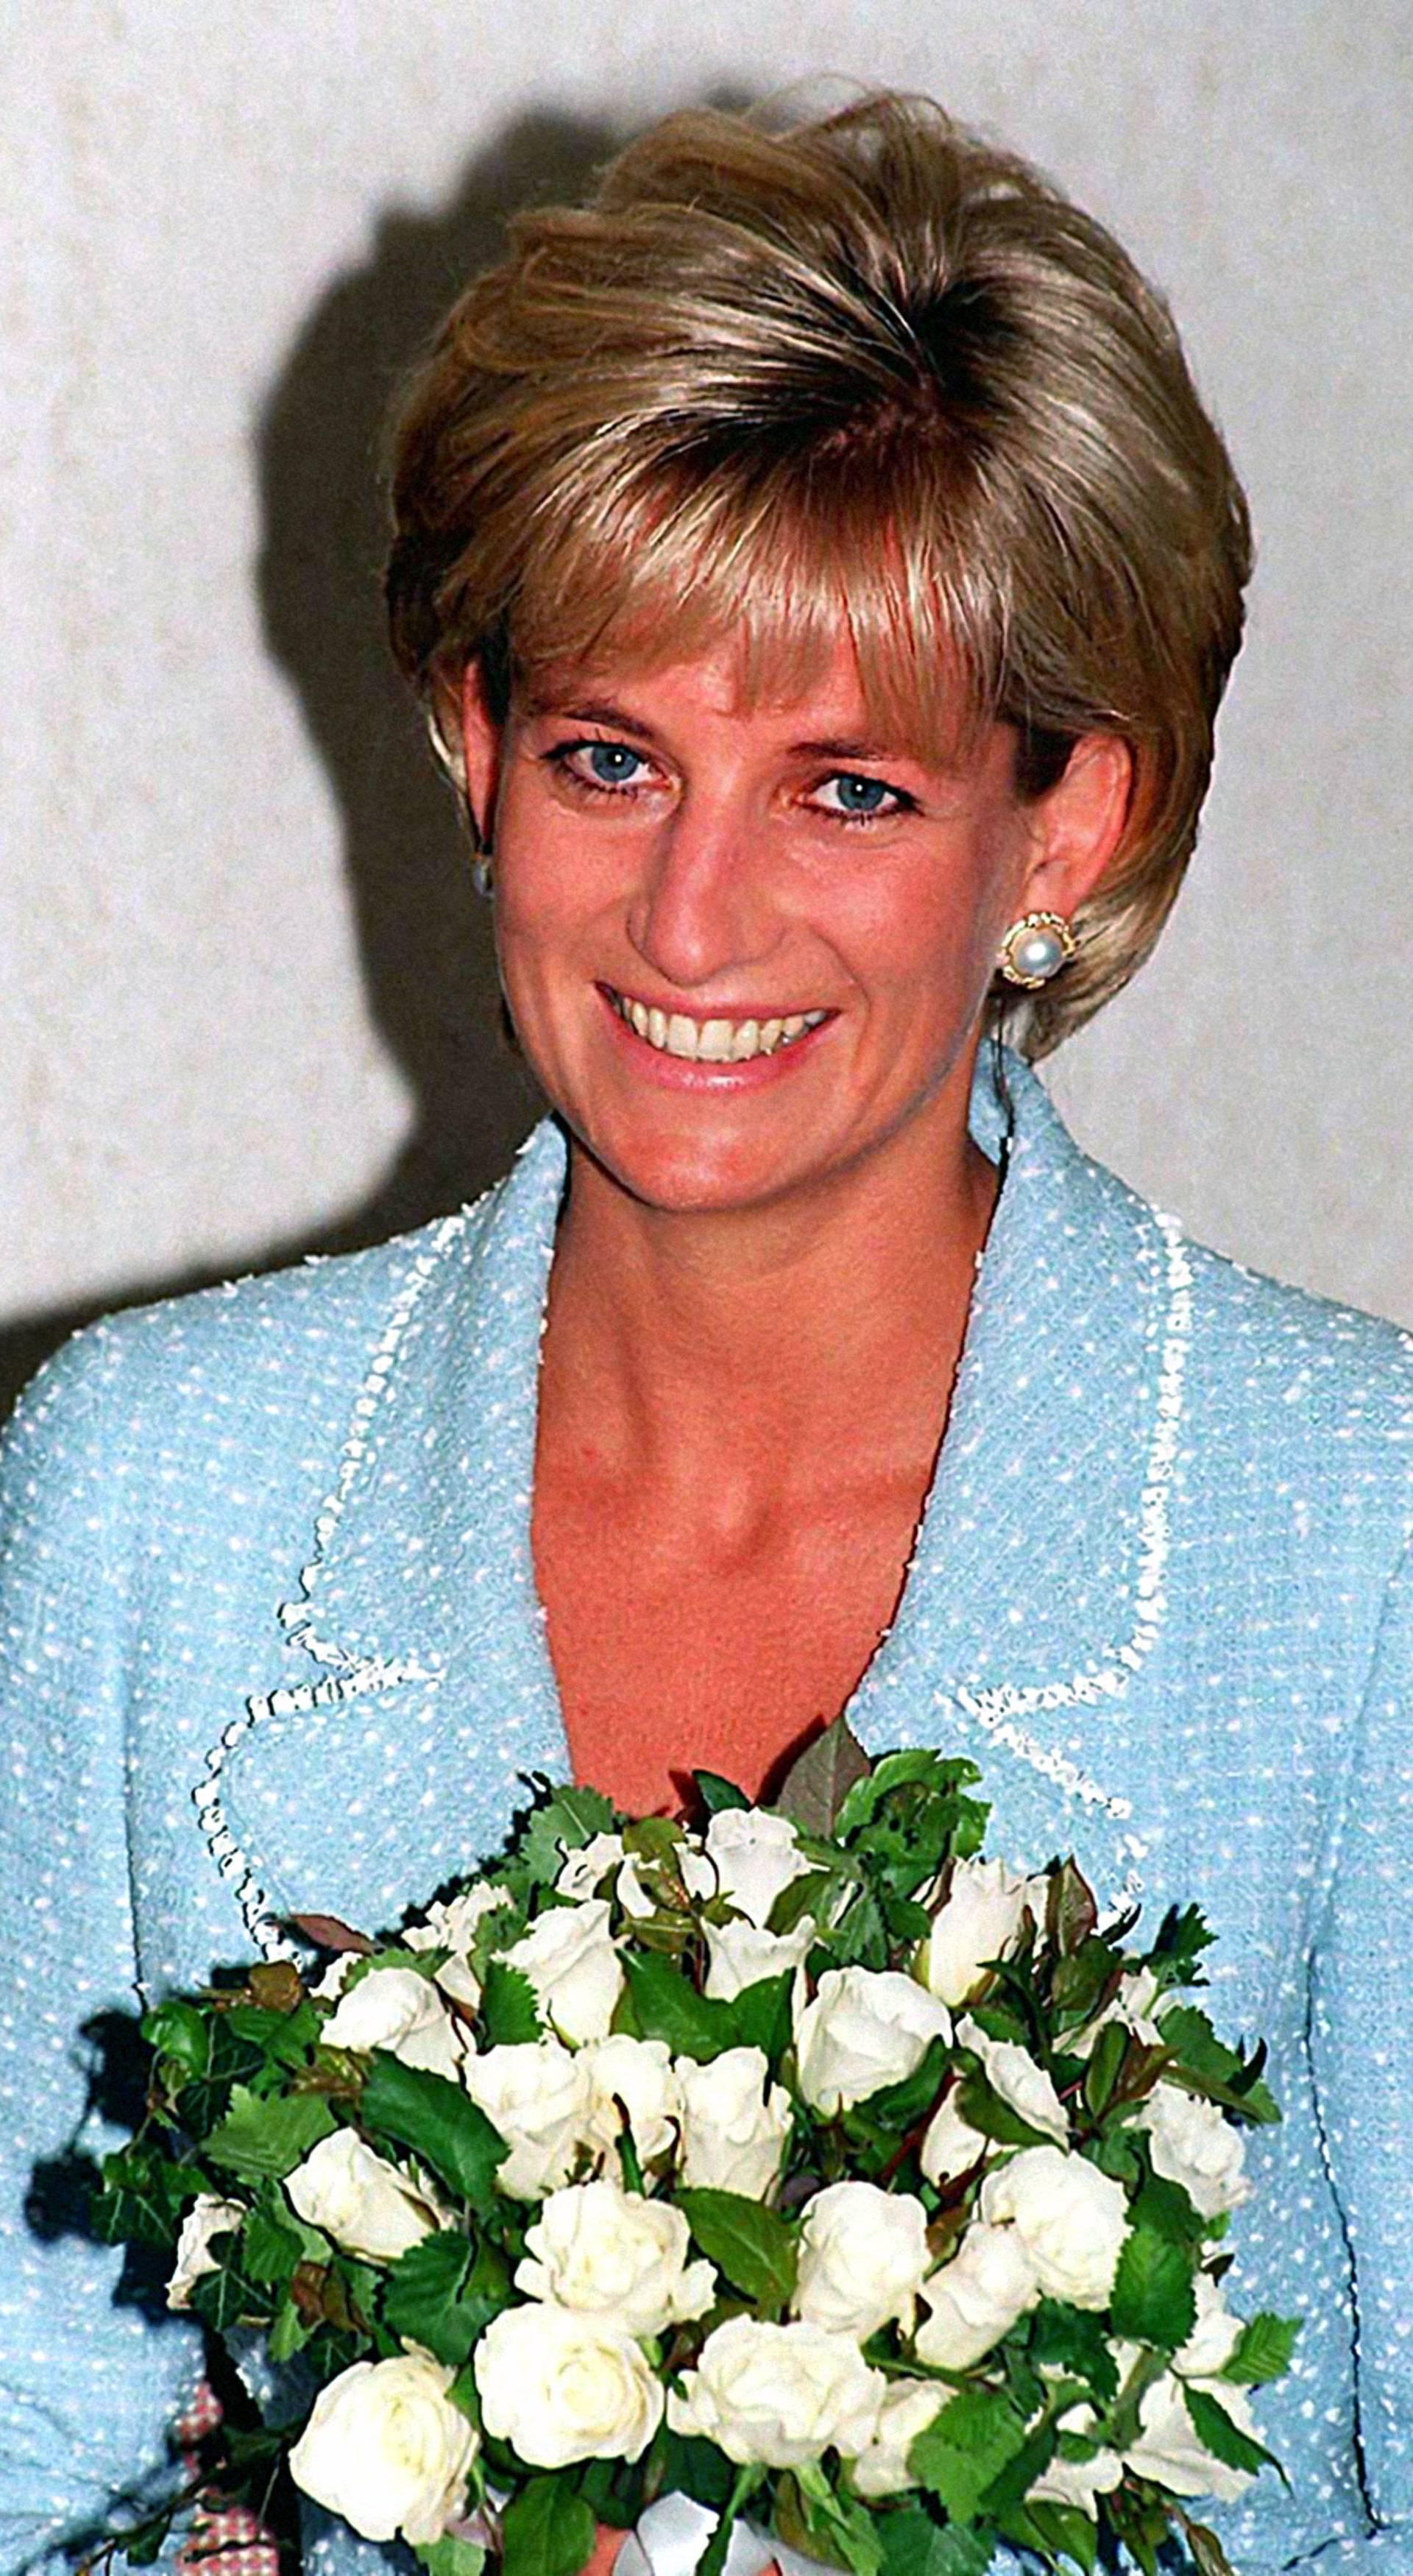 Princess Diana Channel 4 documentary